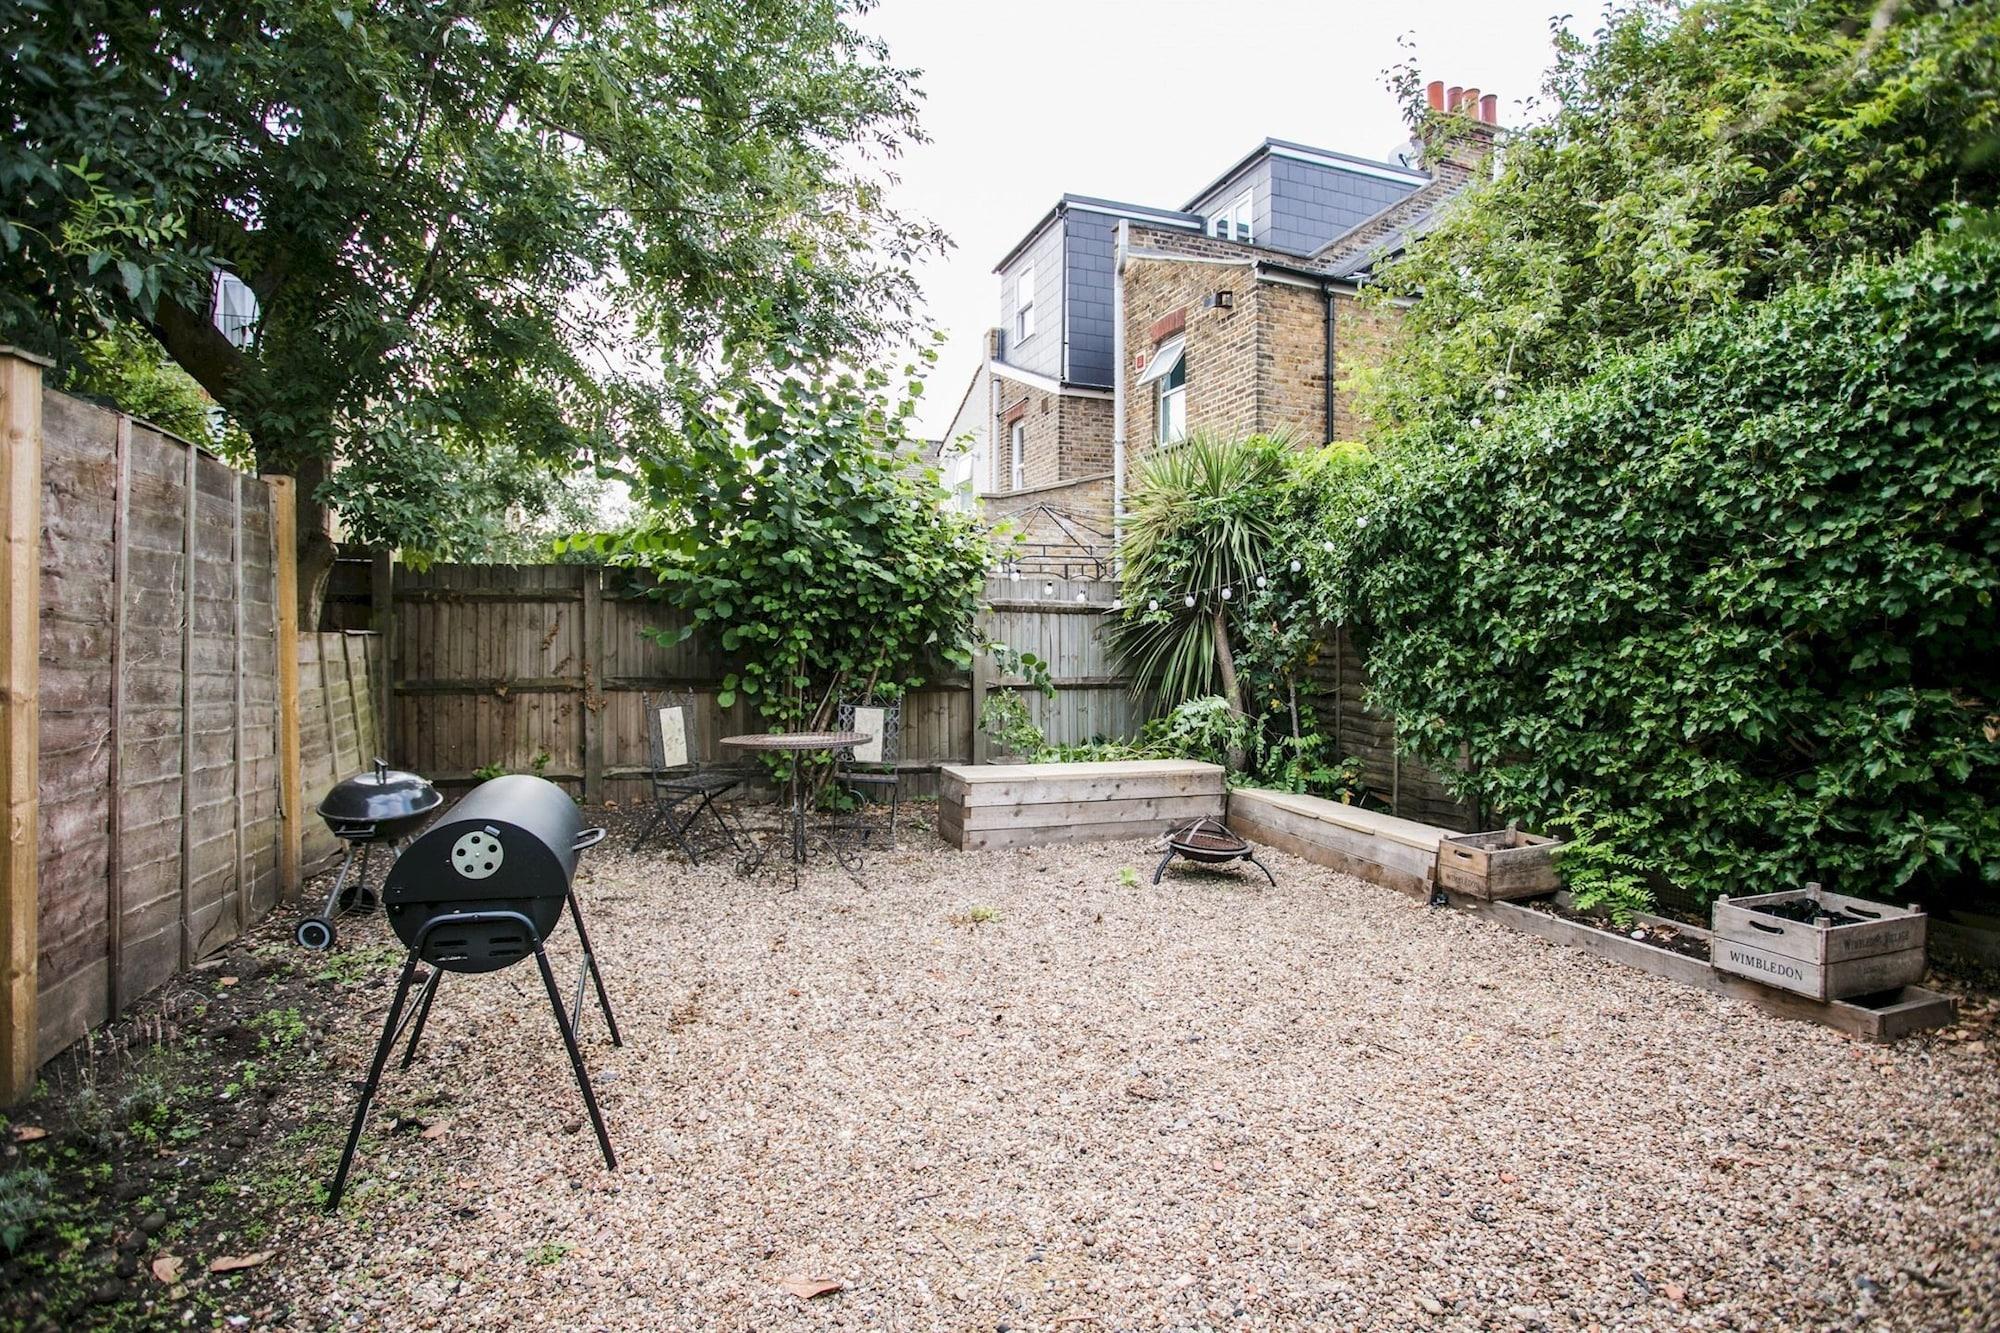 1 Bedroom Flat in Wimbledon With Garden, London